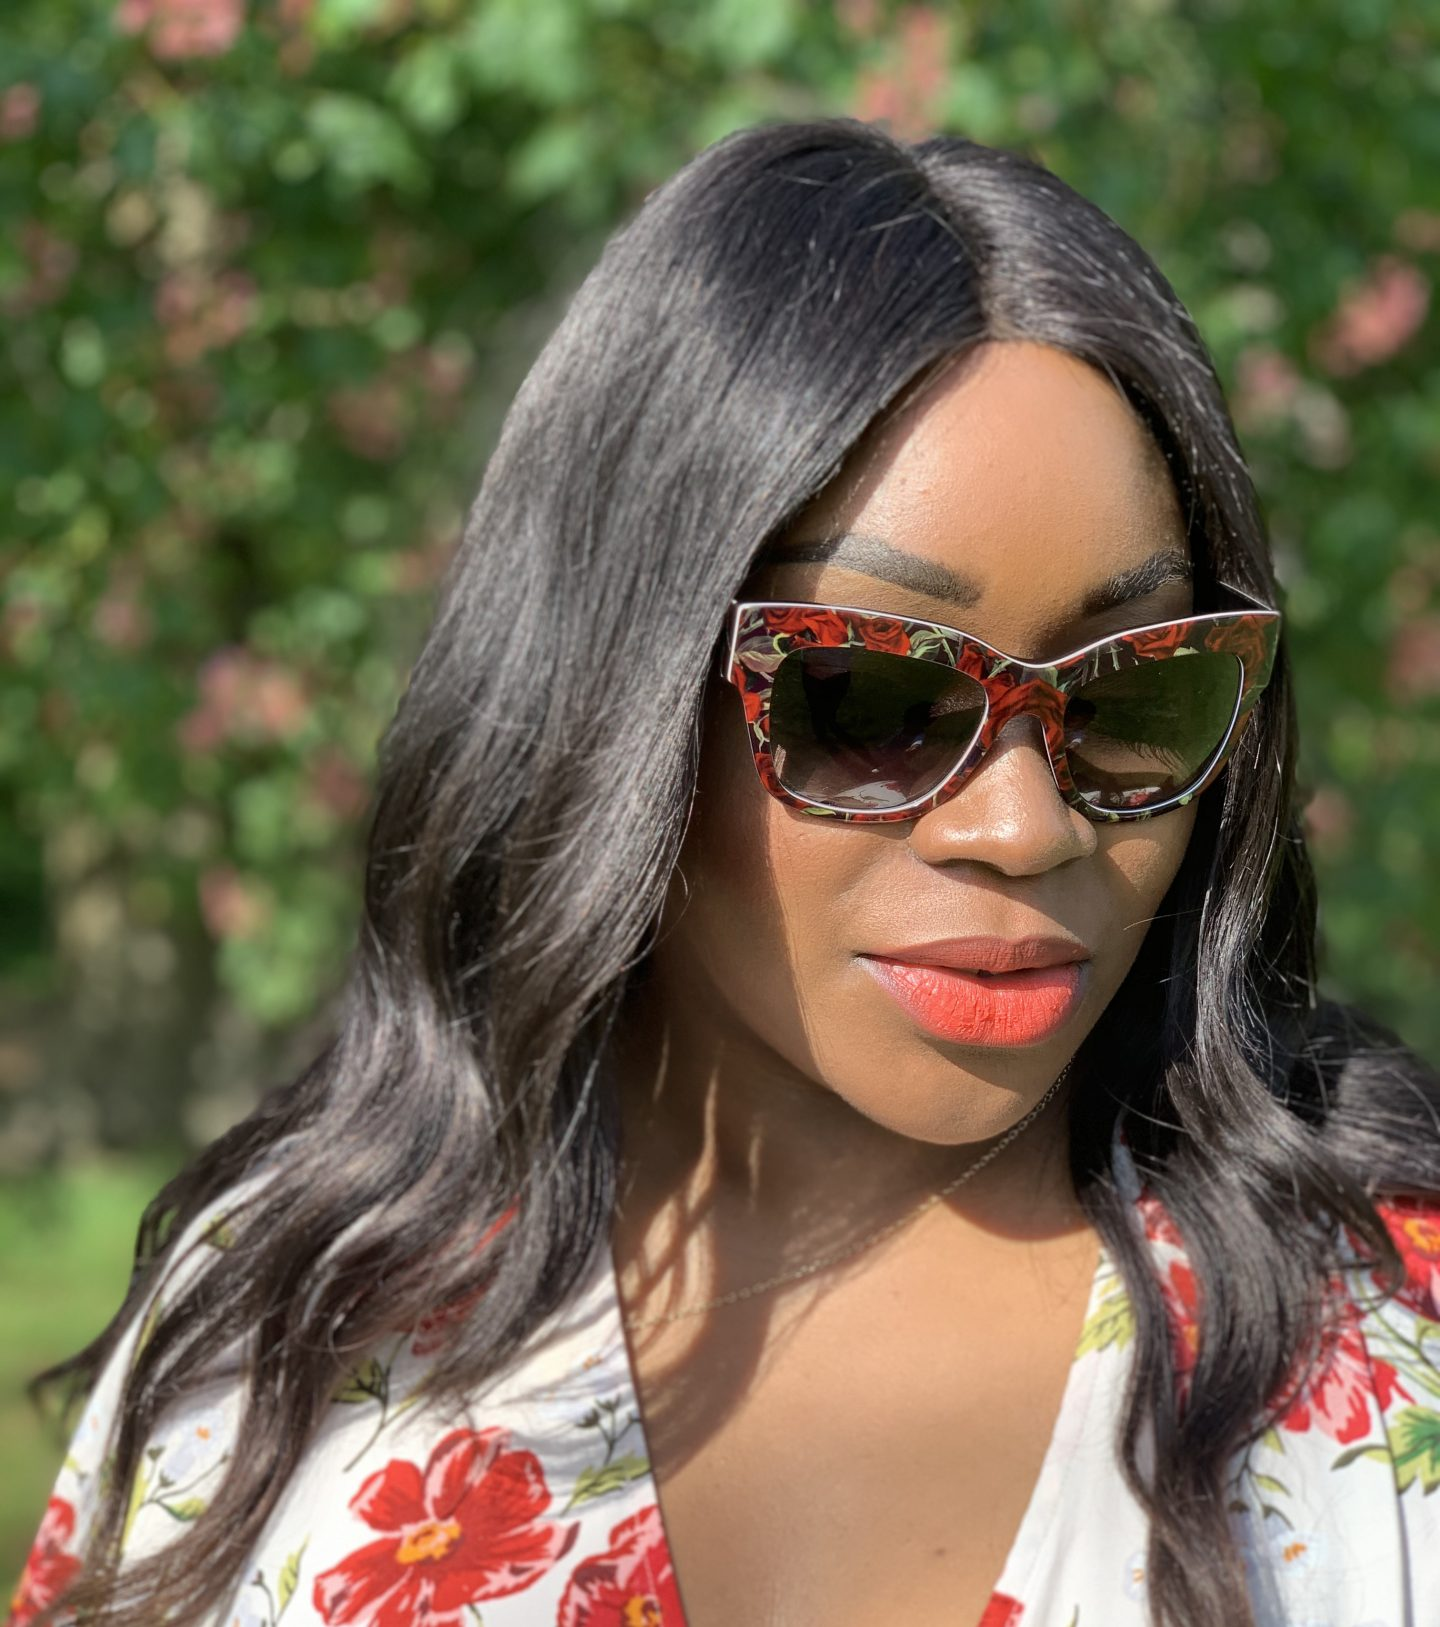 Mum a Porter Dolce and Gabbana sunglasses